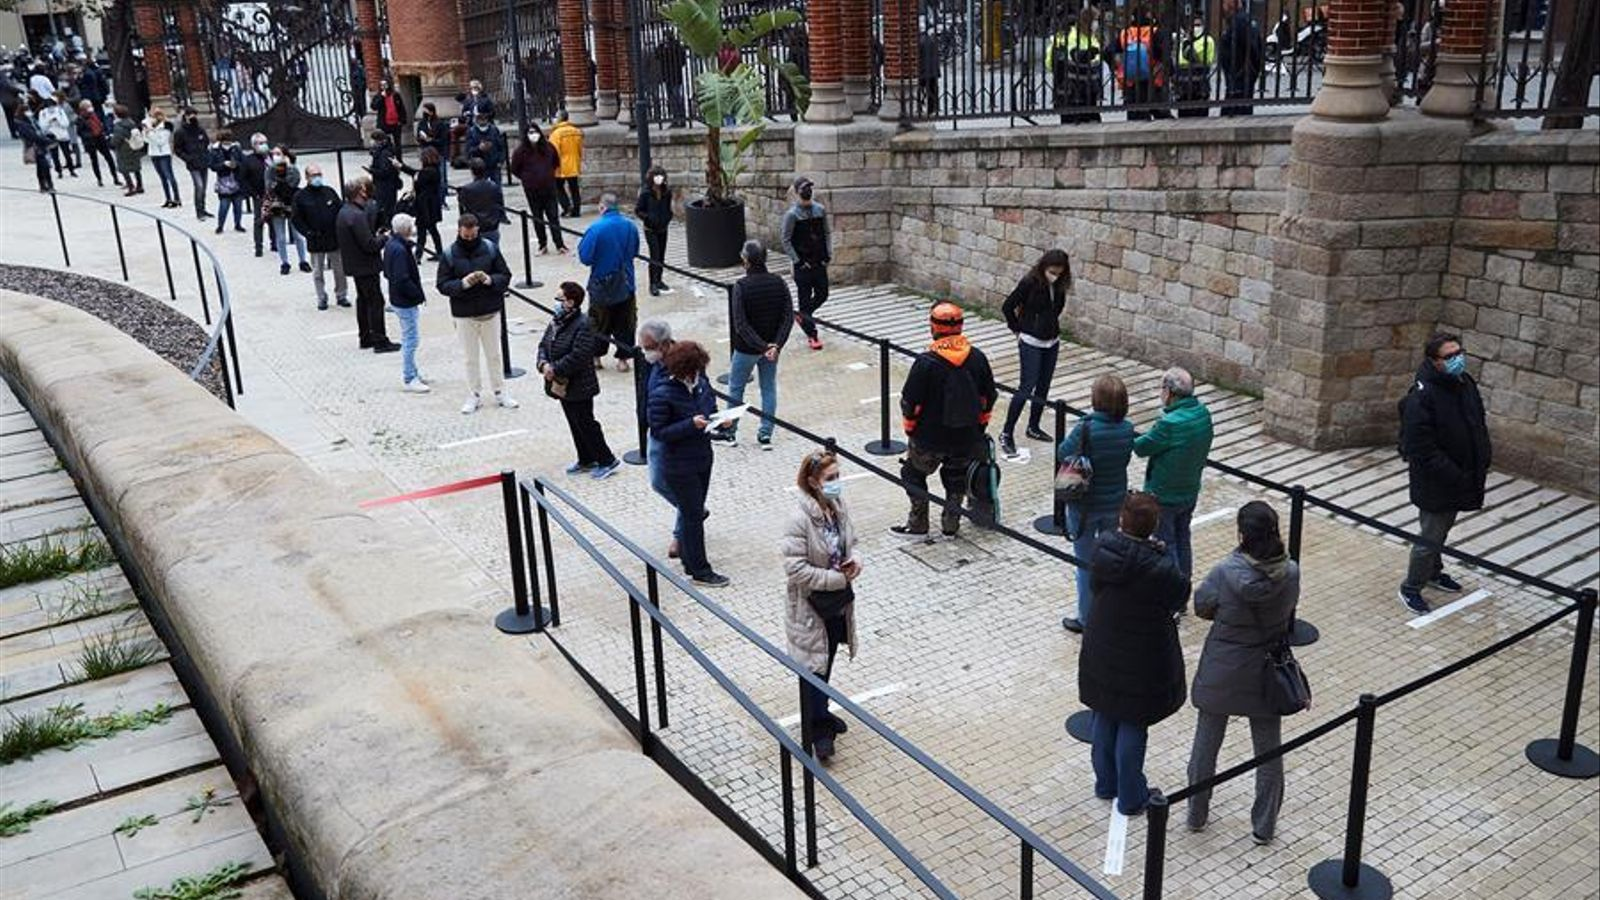 Diversos ciutadans fan cua al recinte modernista de Sant Pau de Barcelona per fer-se un test antigènic